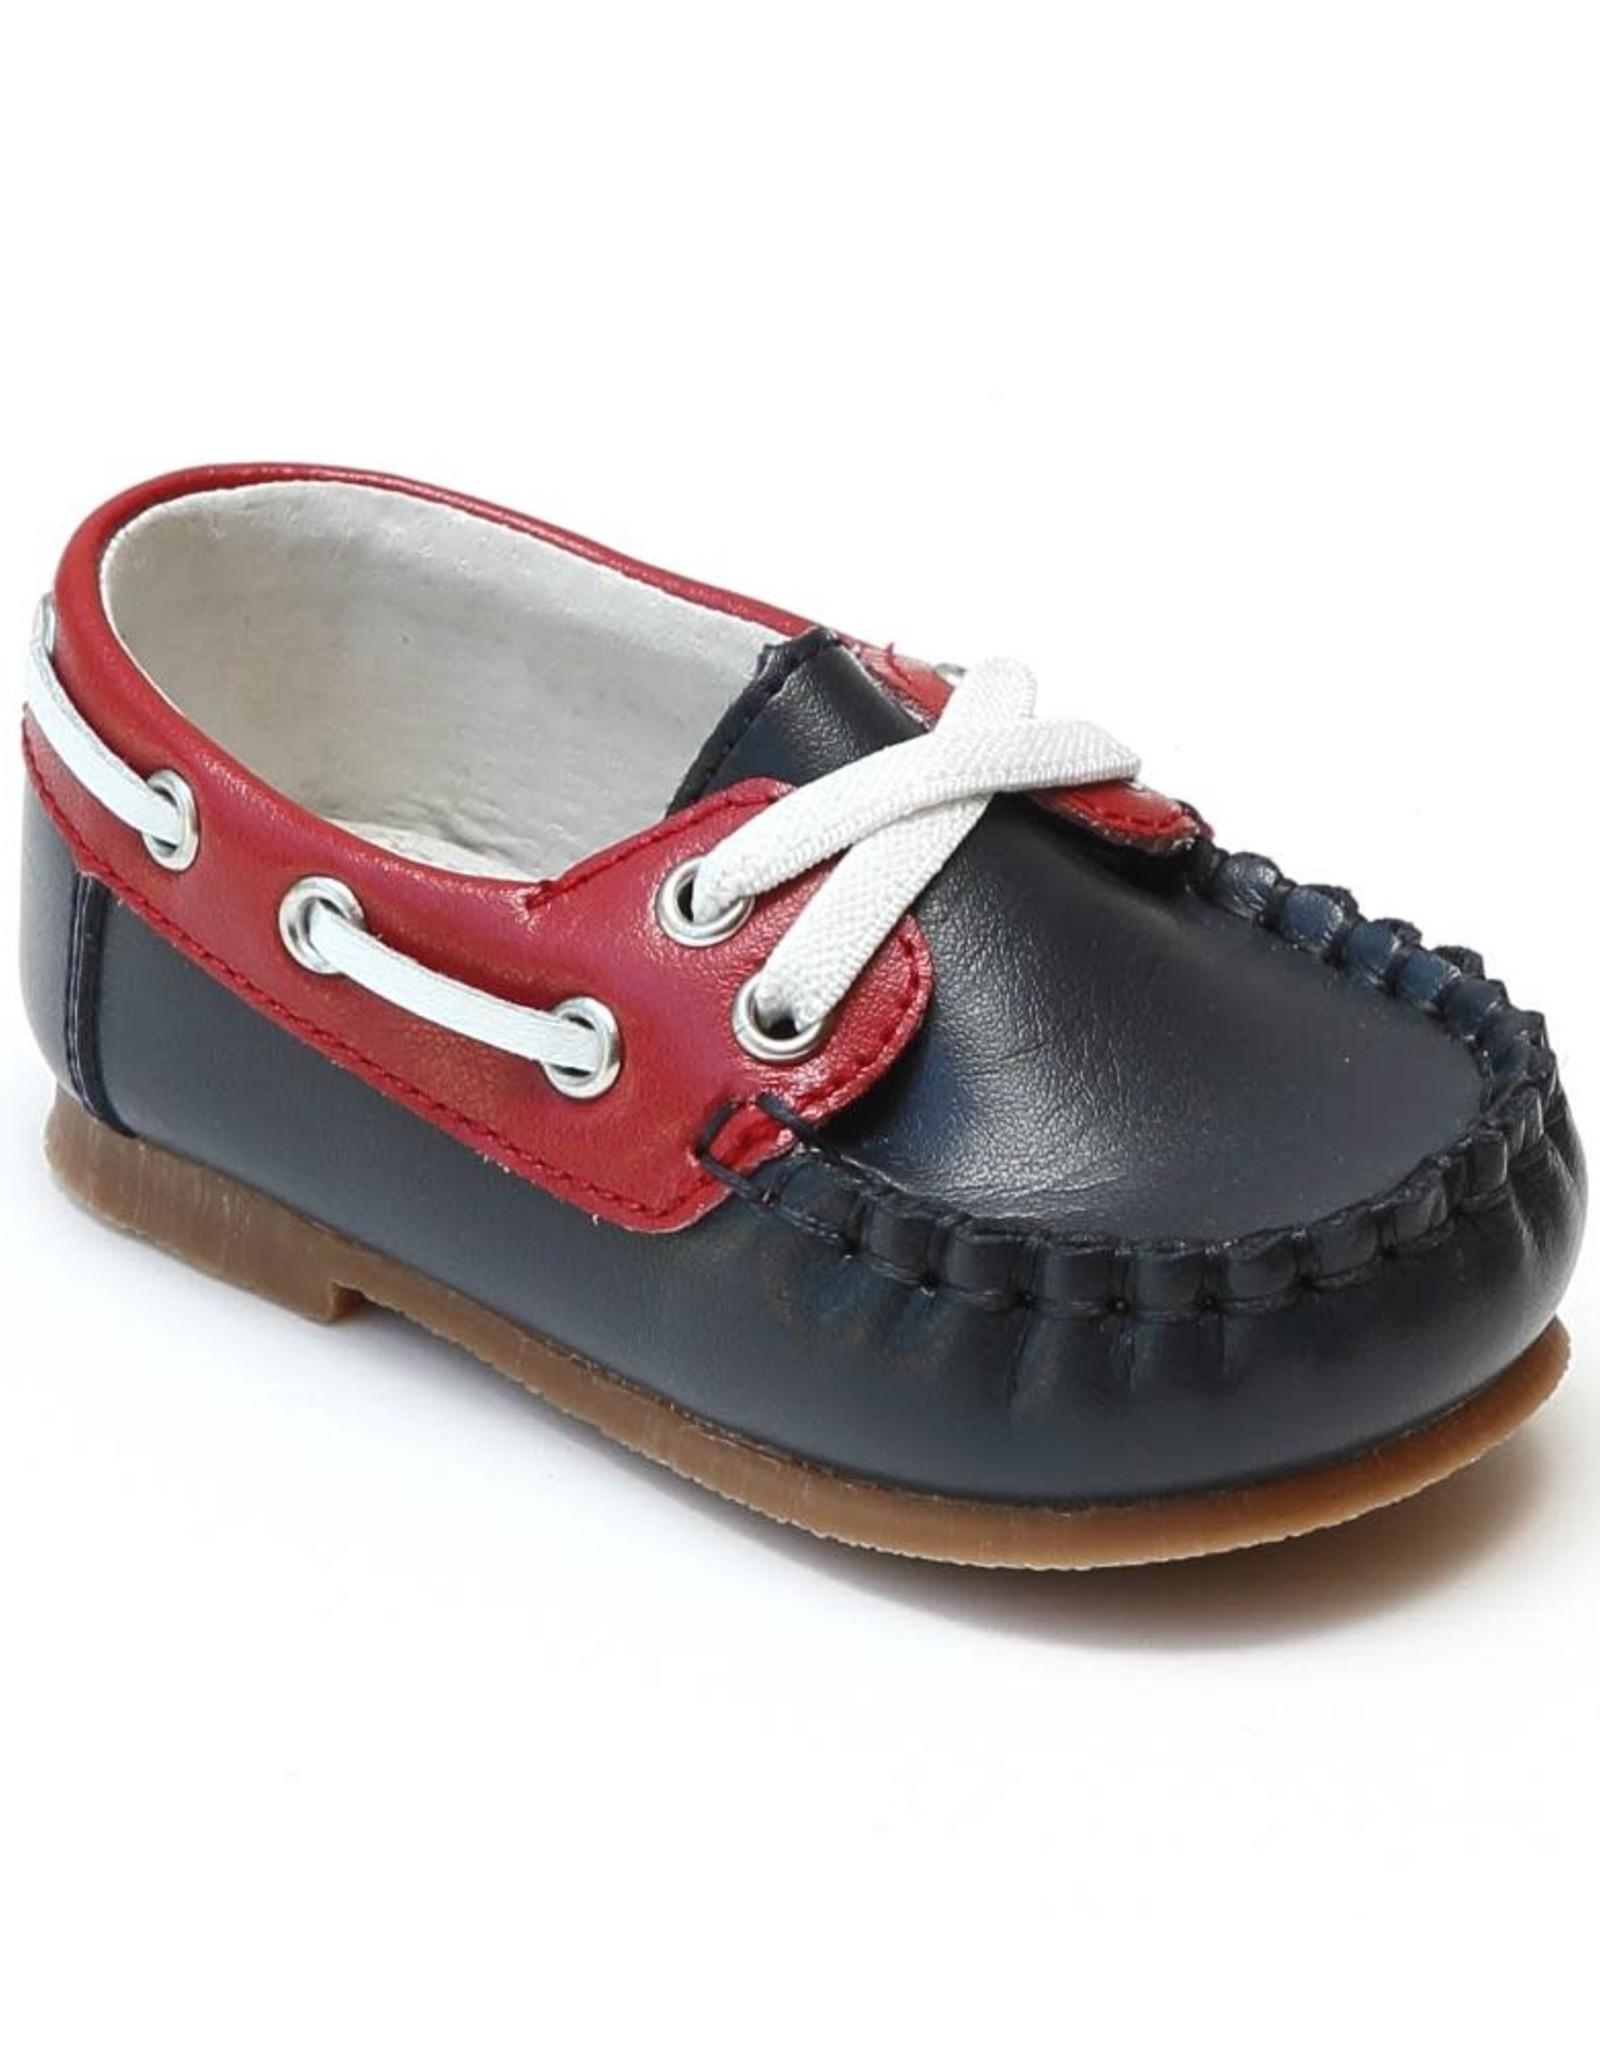 L'AMOUR Hudson Boat Shoe